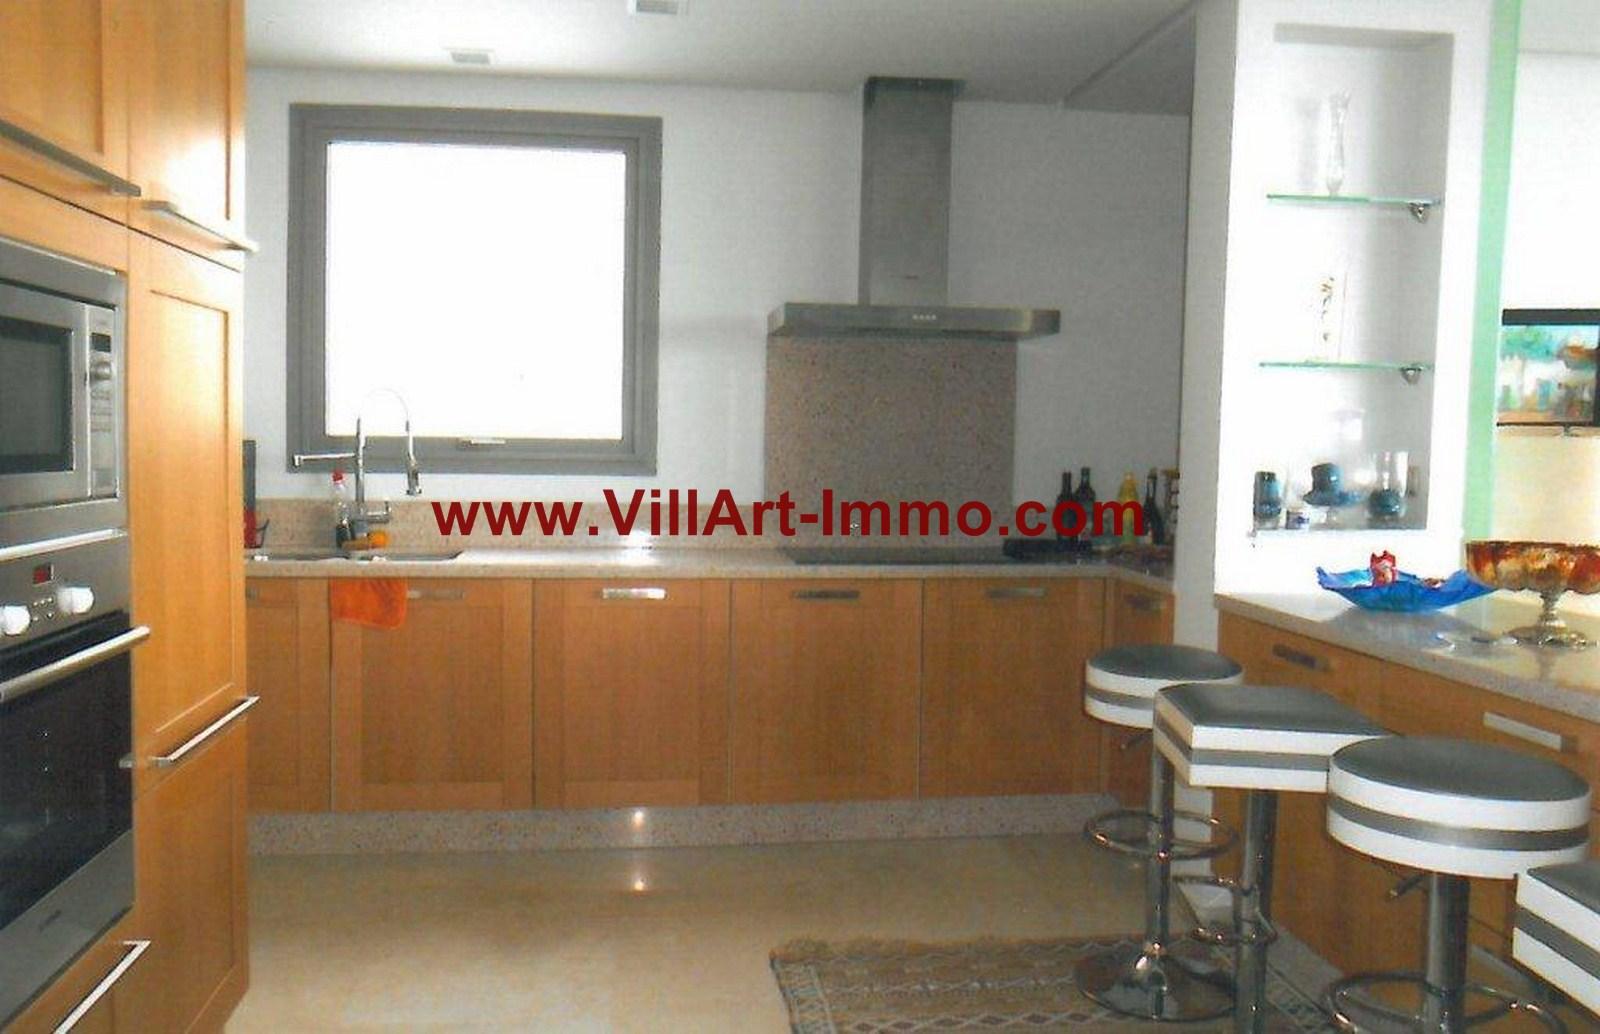 4-Location-Appartement-Meublé-Tanger-Cuisine-L749-Villart immo